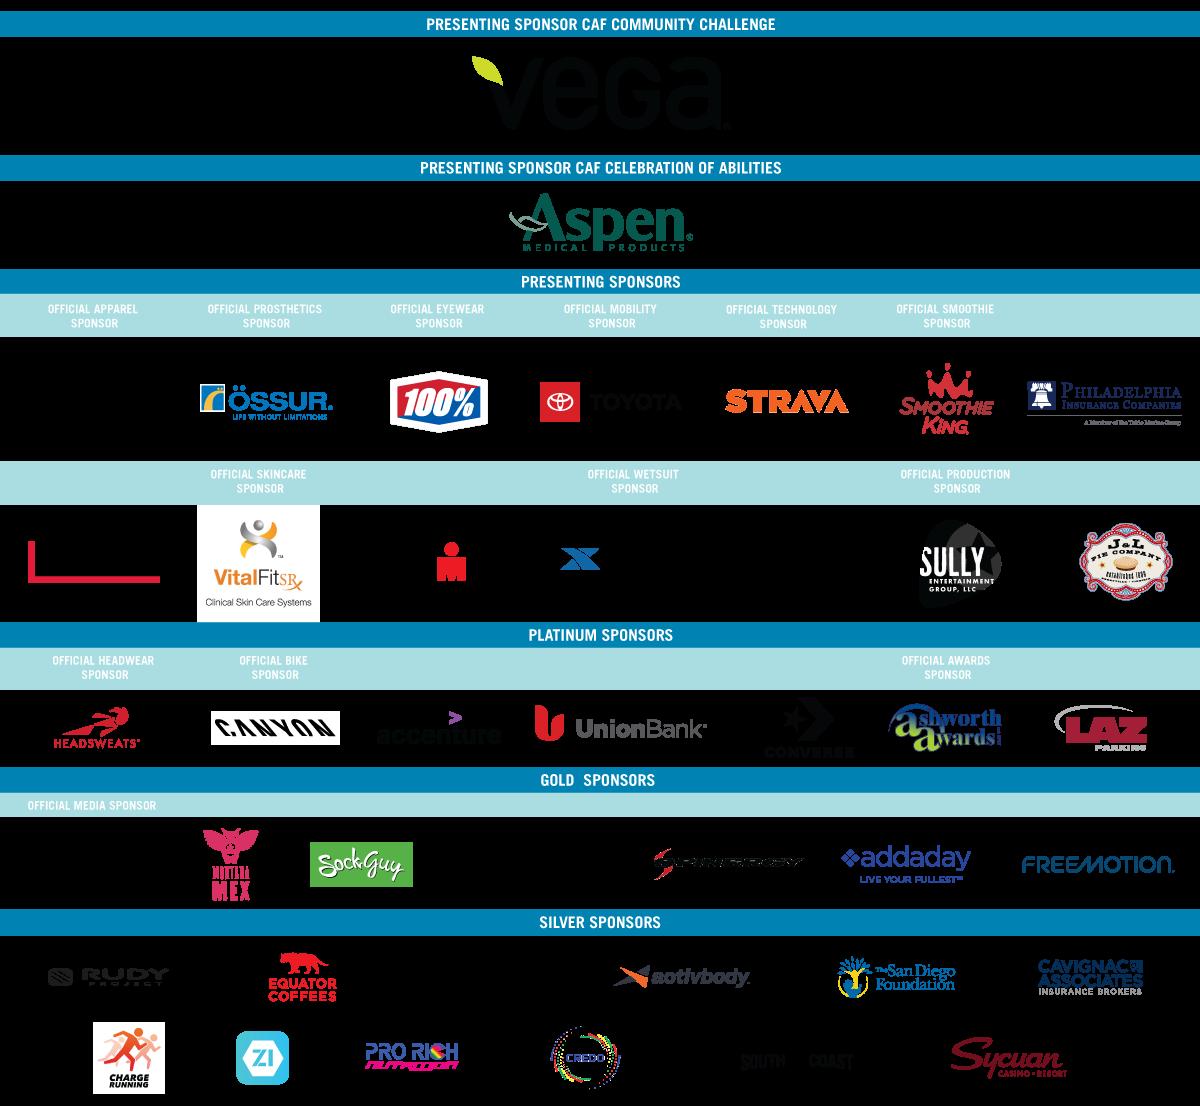 2020 CCC Sponsor Matrix